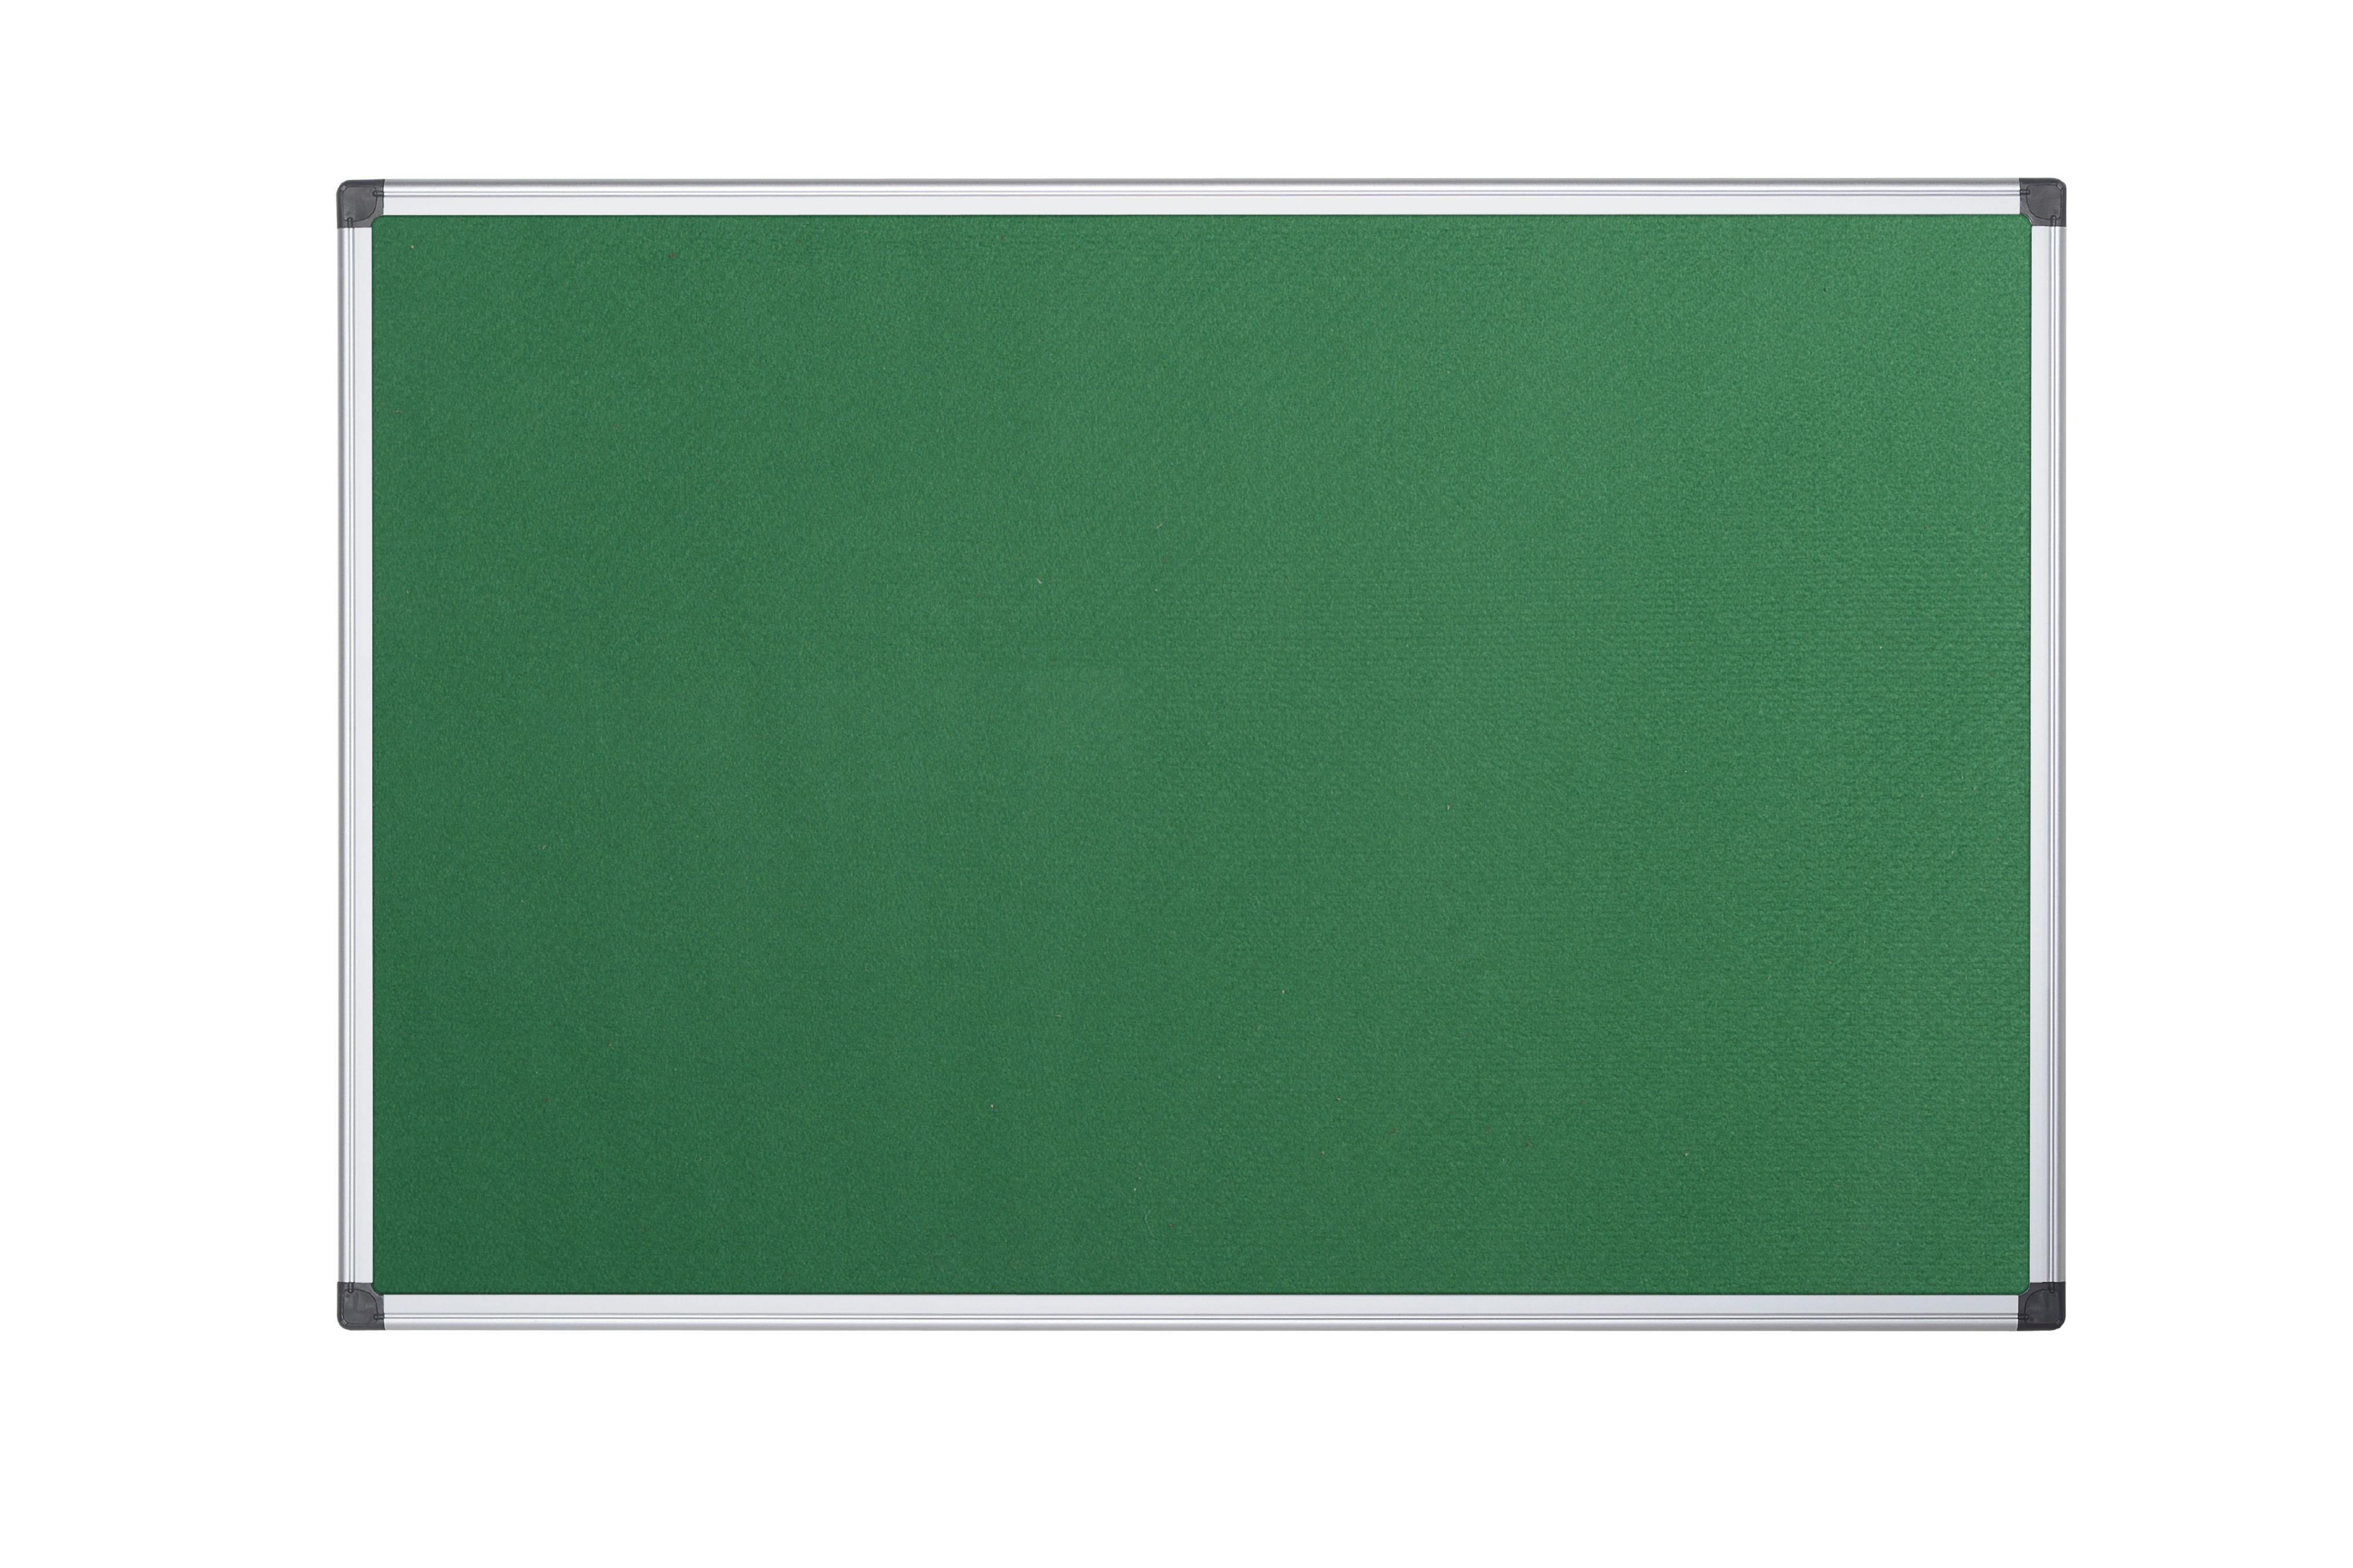 Felt Bi-Office Maya Green Felt Noticeboard Aluminium Frame 2400x1200mm